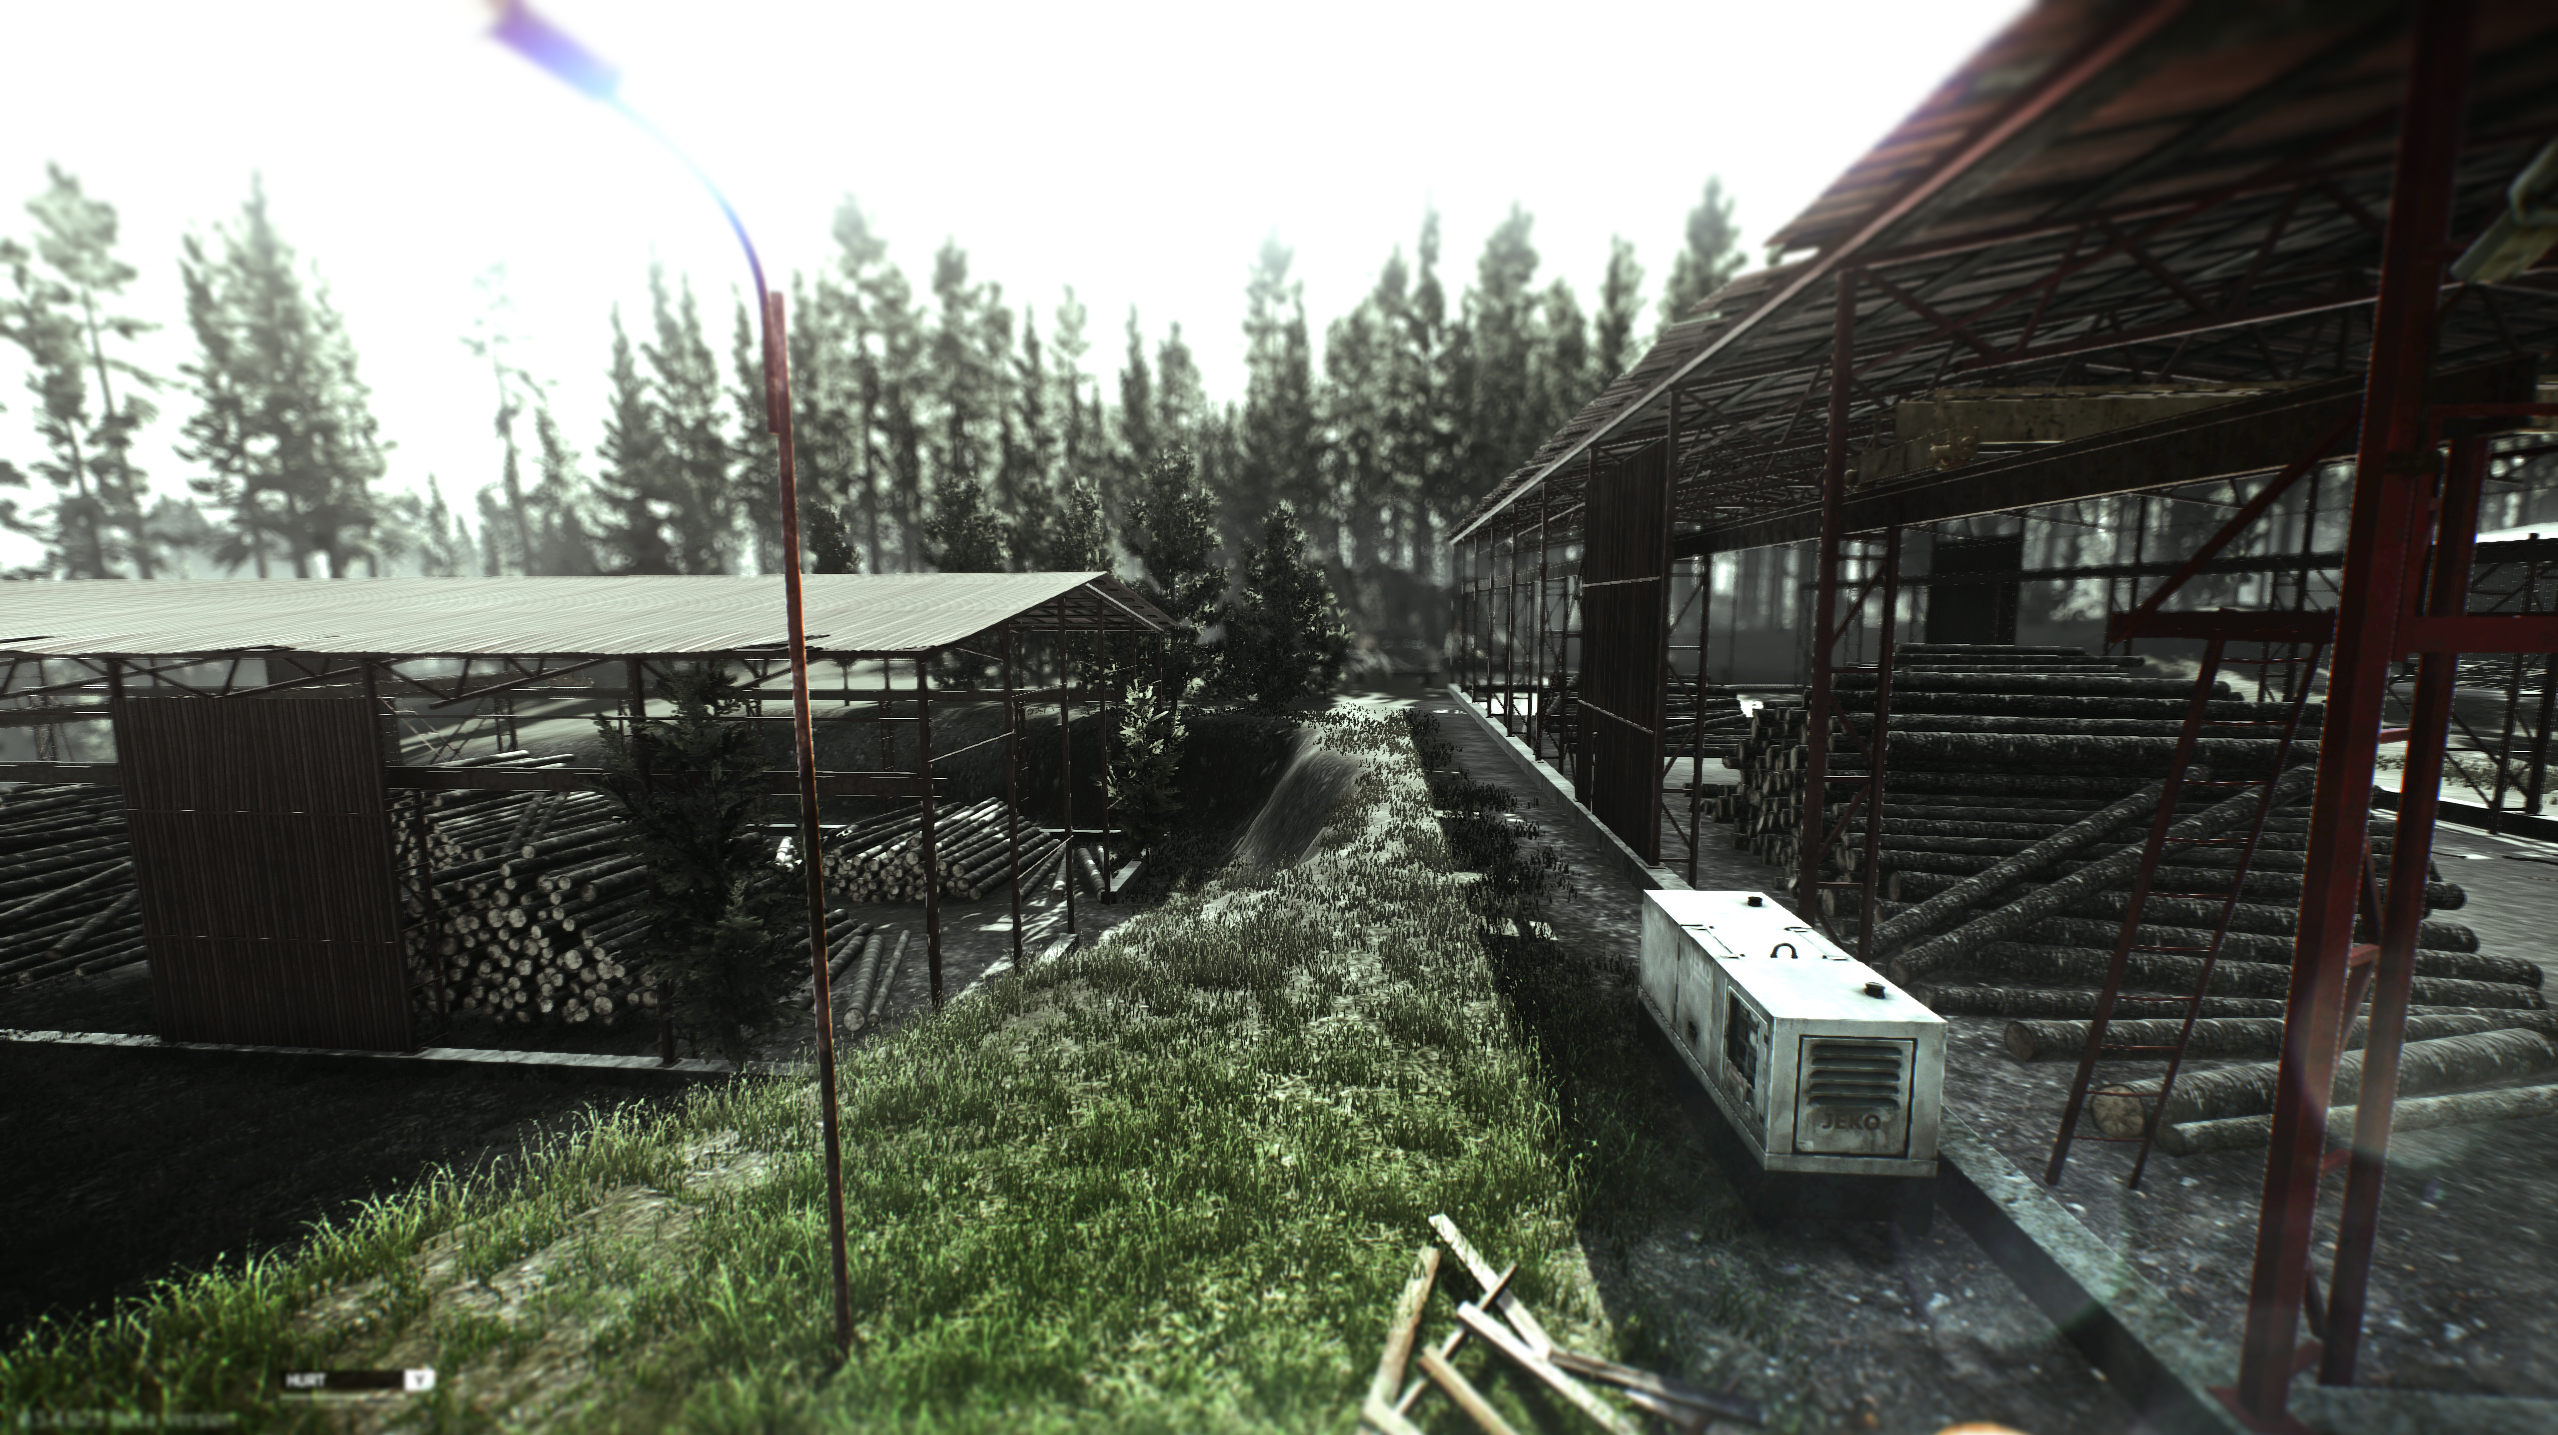 Reshade Escape from Tarkov - Page 2 - General game forum - Escape